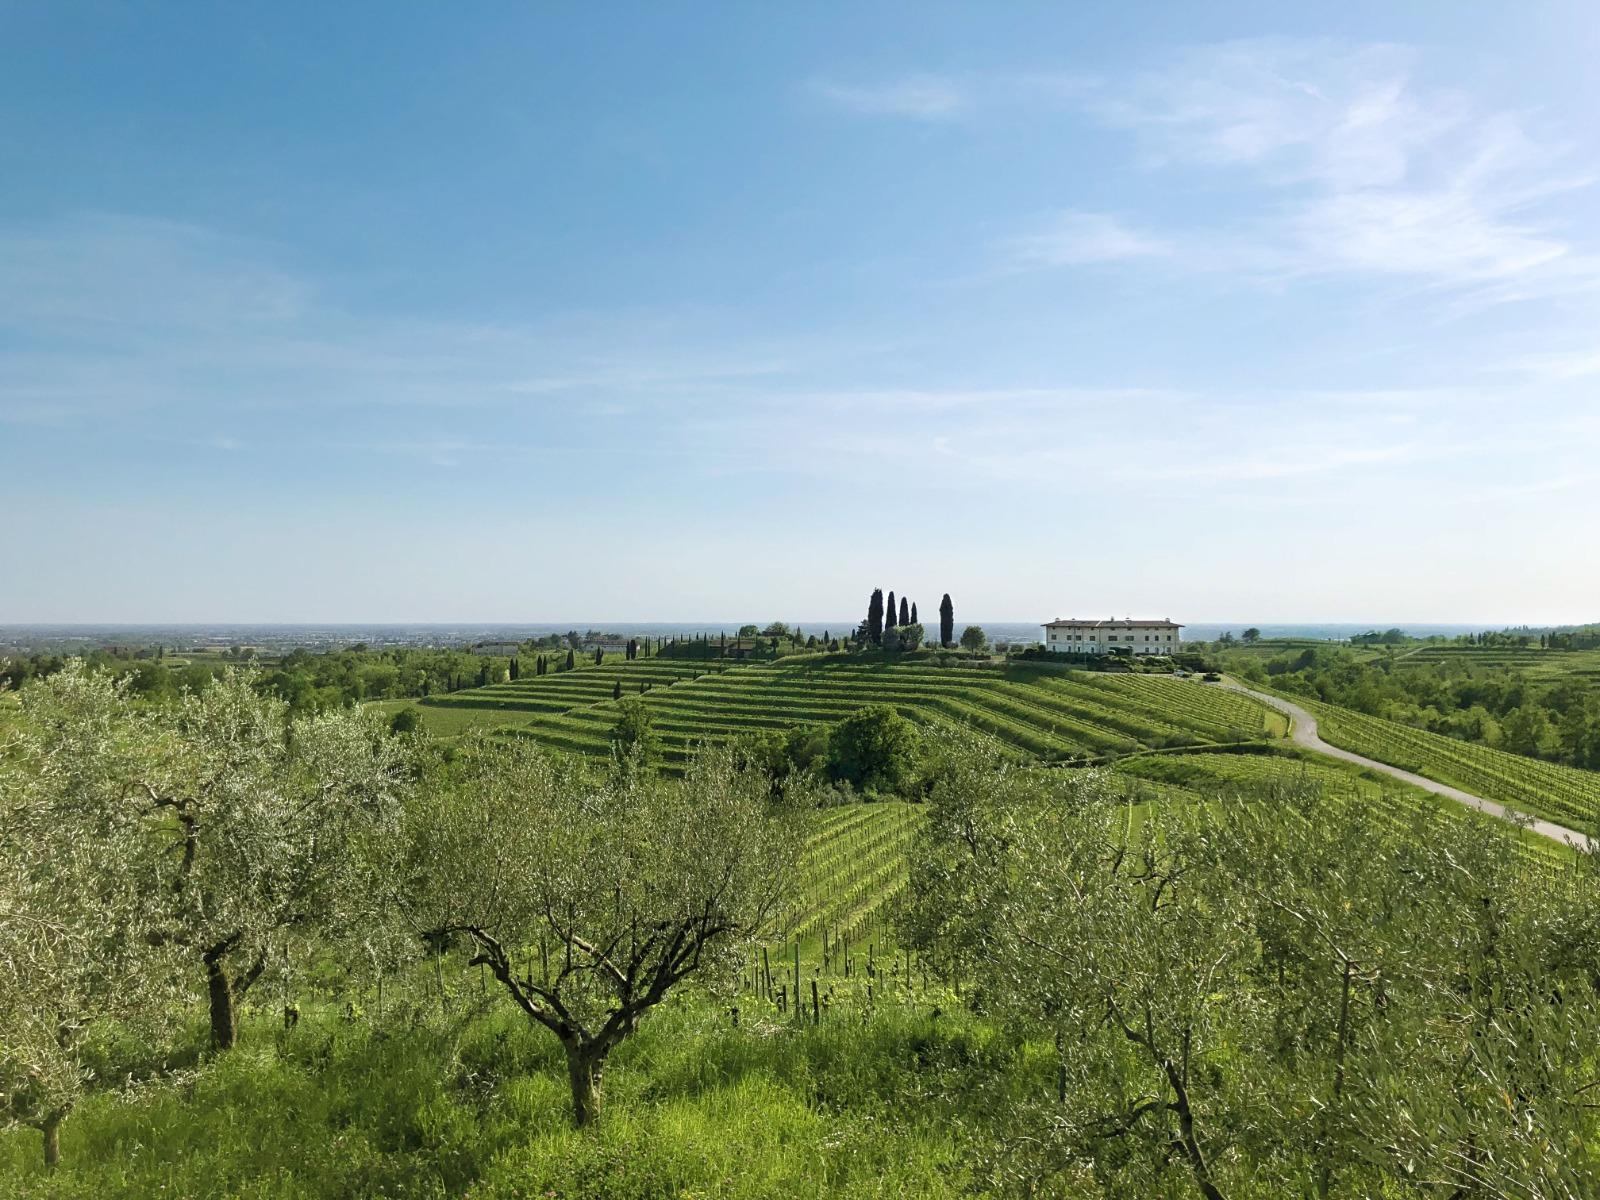 vigne di zamo vineyard